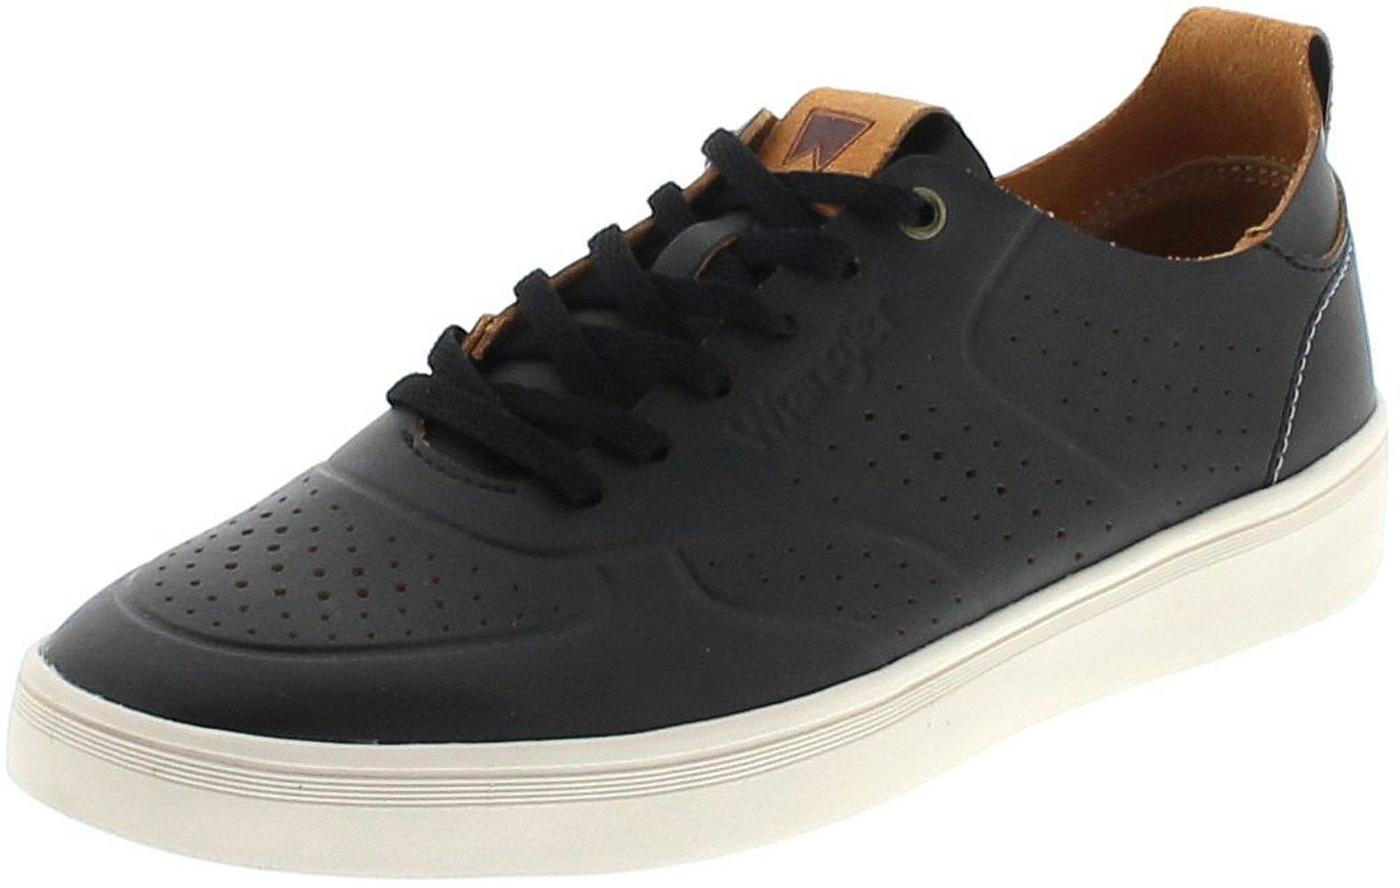 Wrangler WM181041 MICKY FREE Black Herren Sneaker - Schwarz